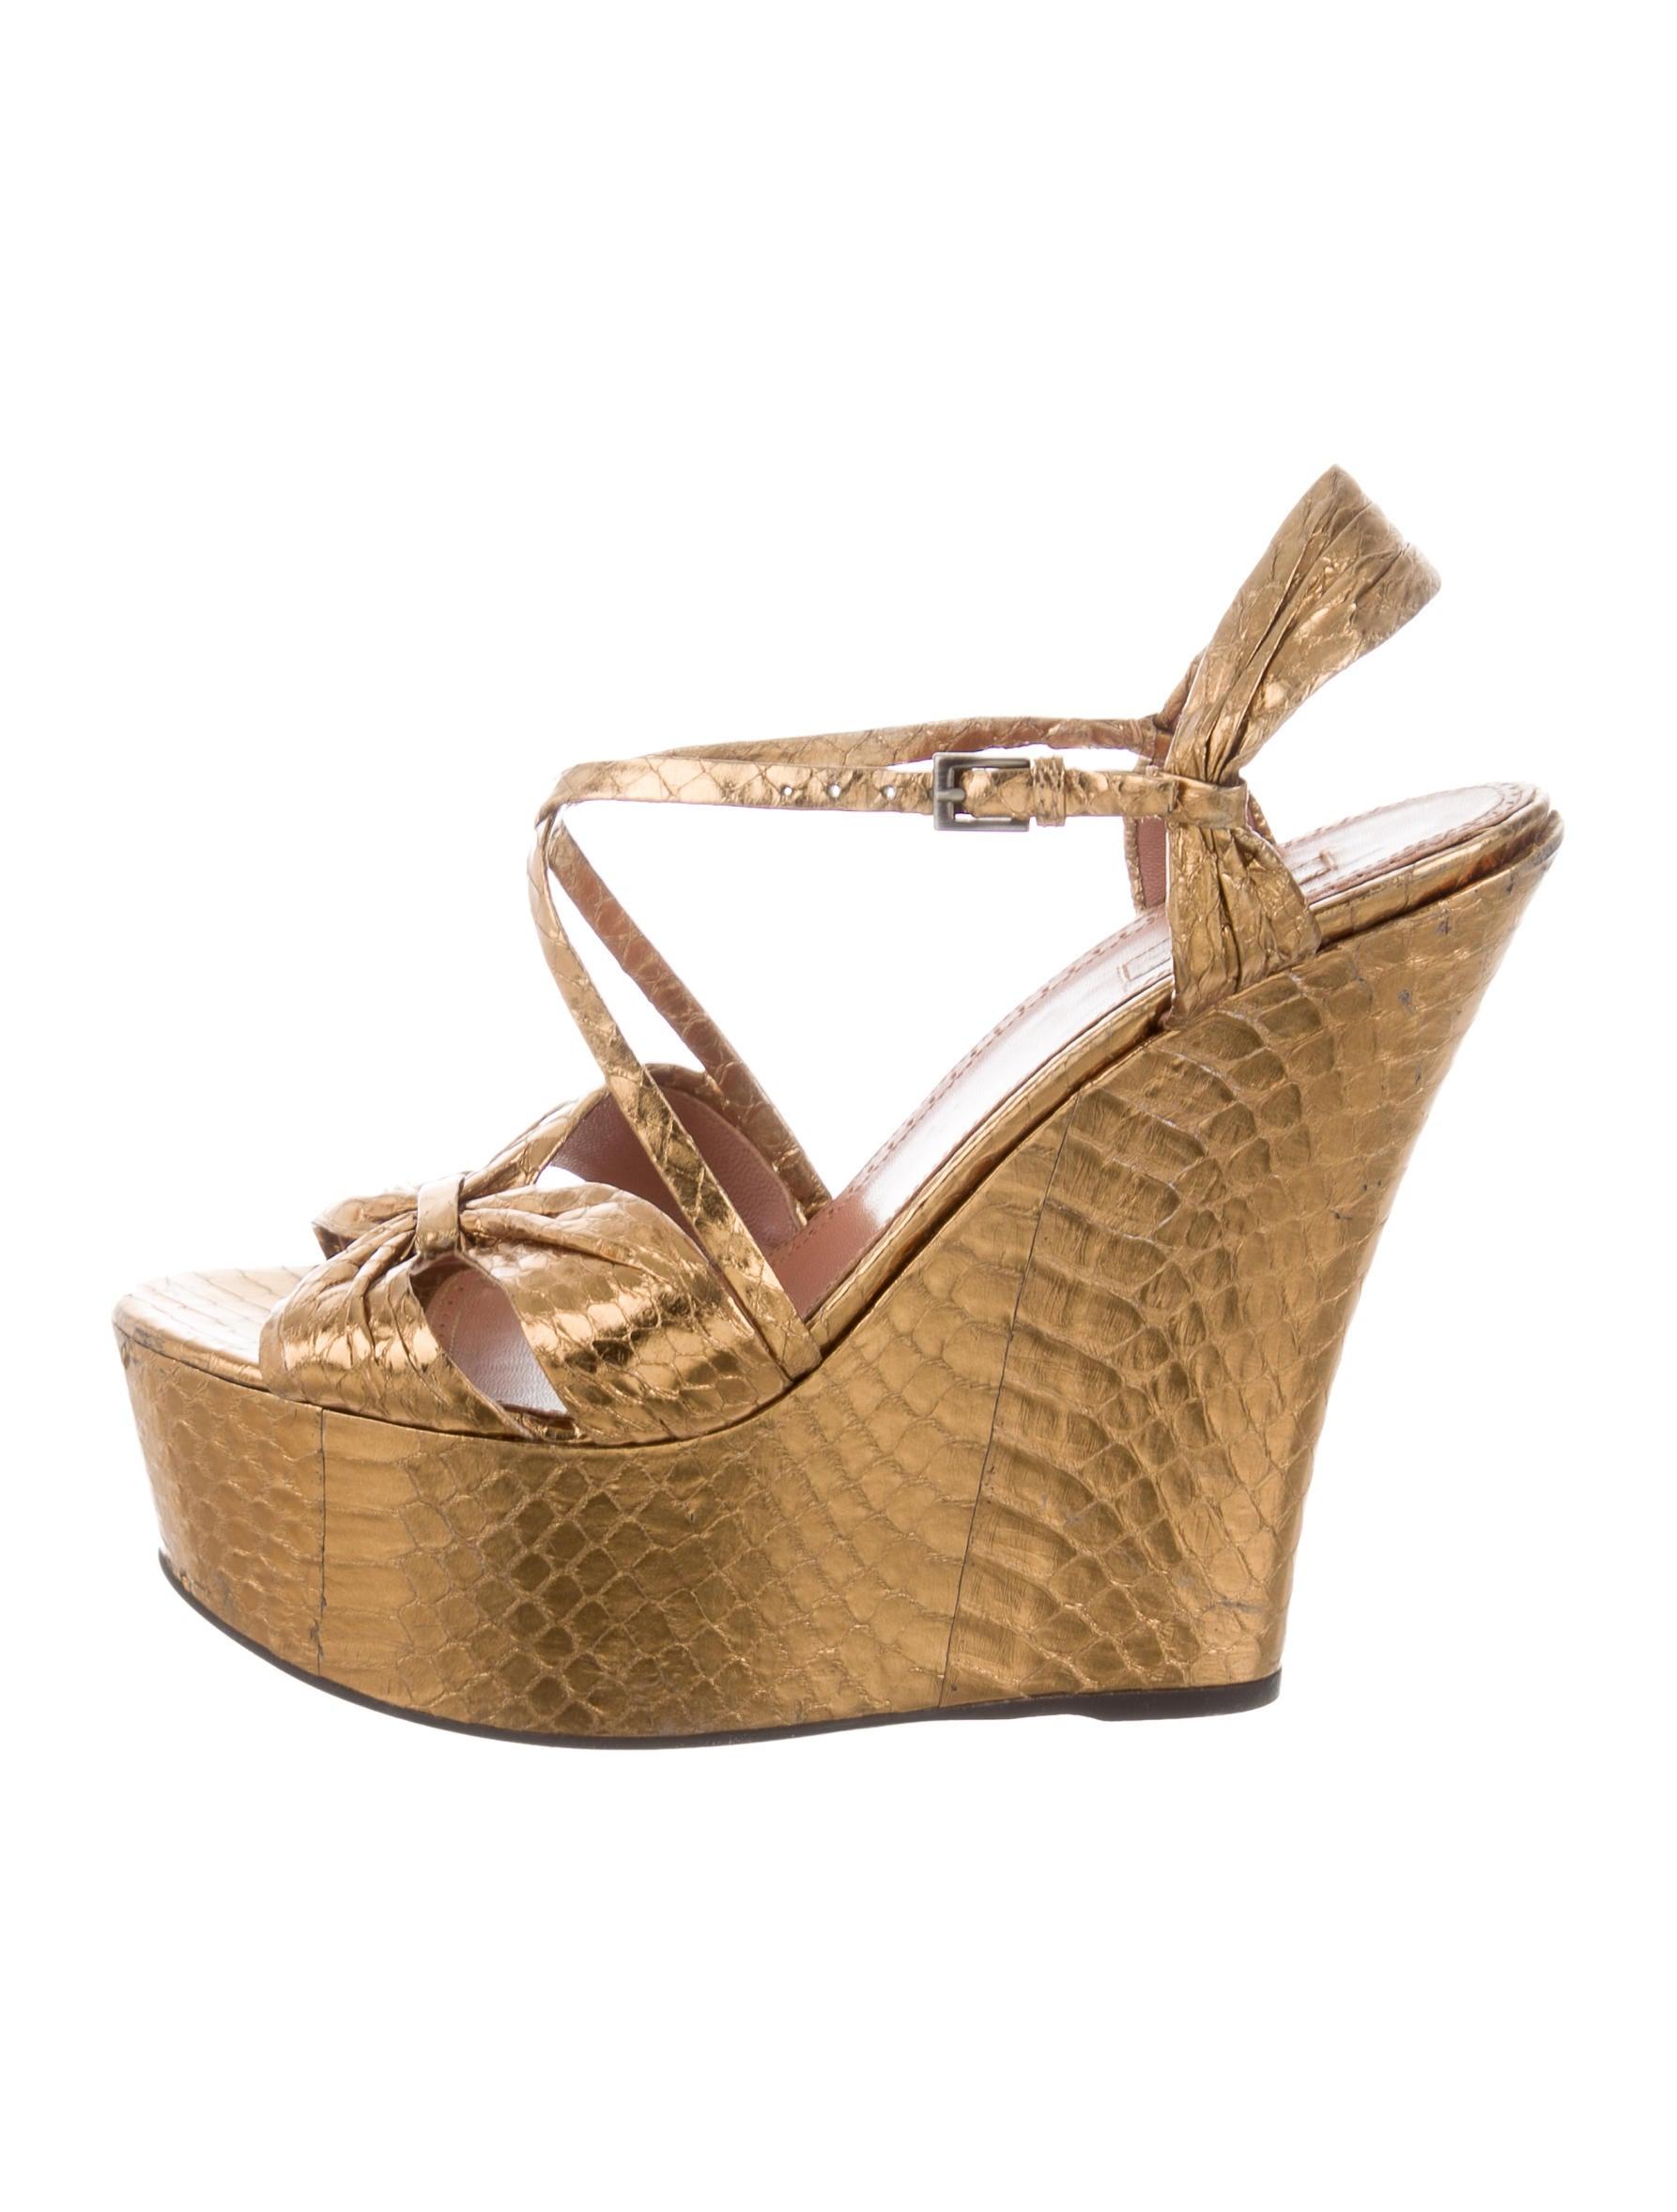 Alaïa Snakeskin Wedge Sandals browse 2014 unisex discount best seller JKXJq